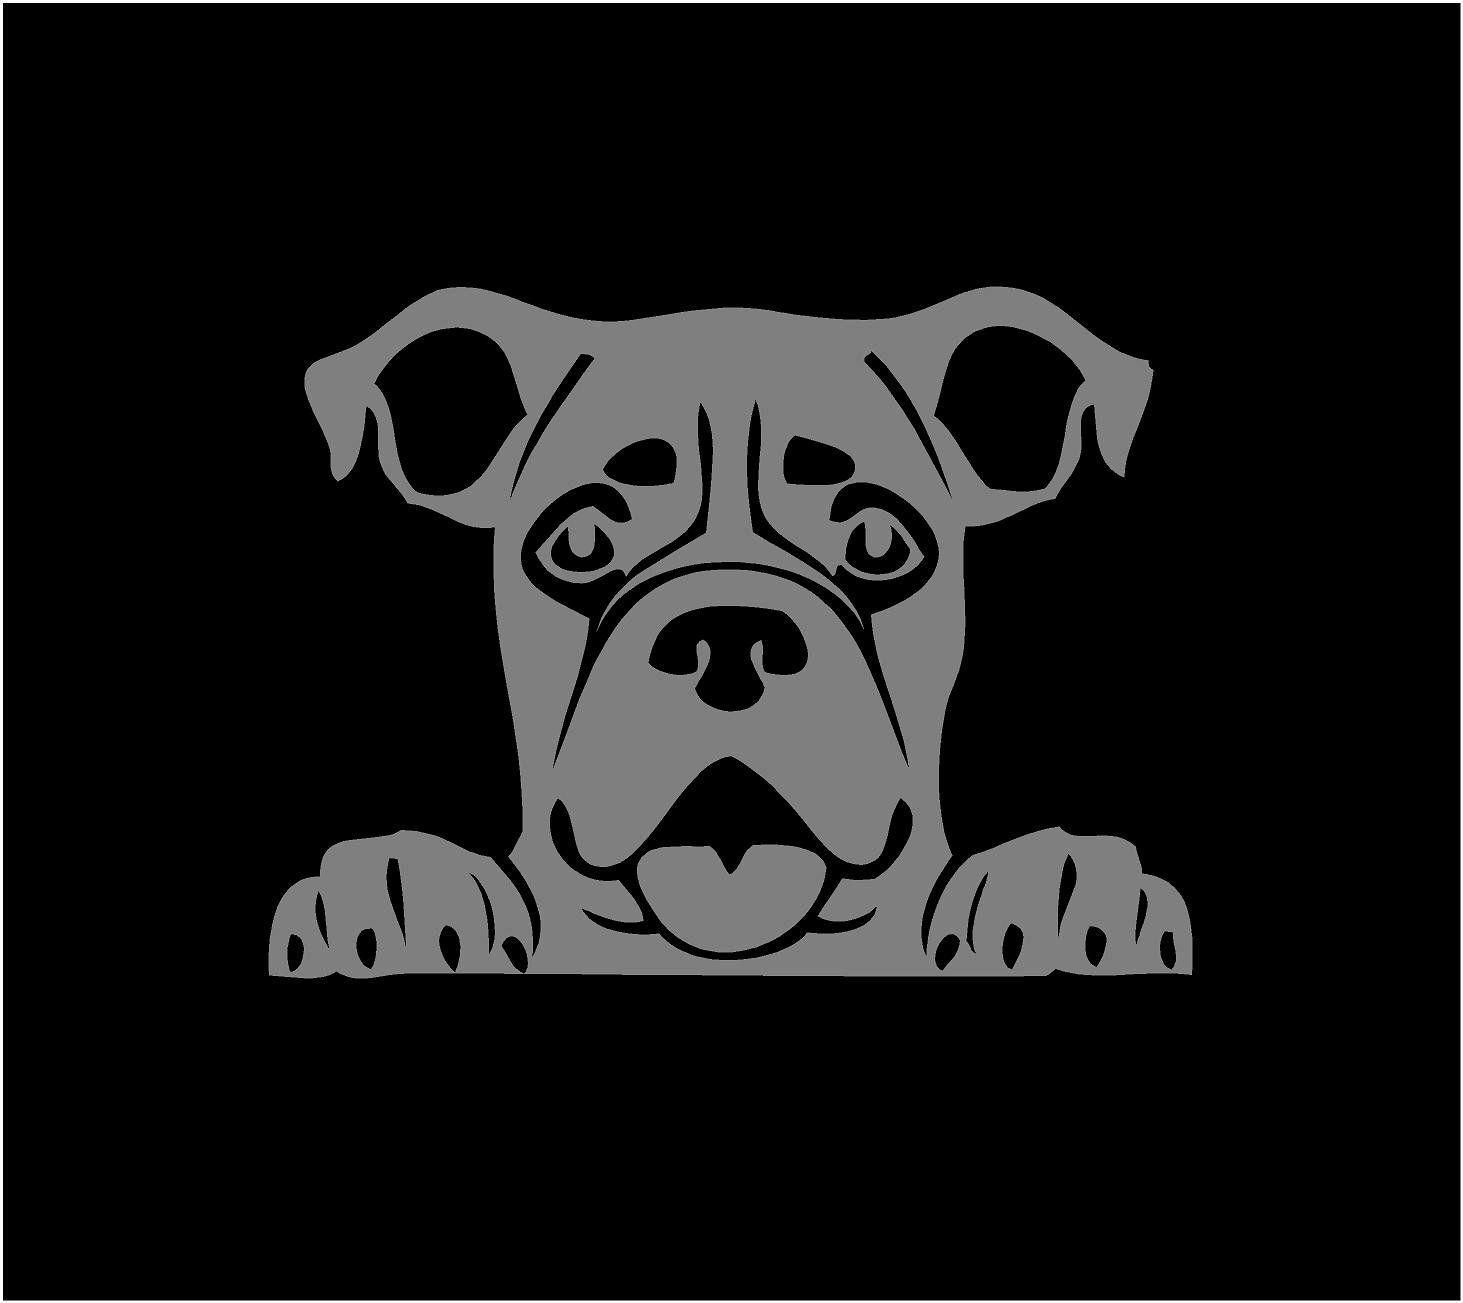 Peeking Boxer Decal Custom Vinyl Car Truck Window Dog Sticker Dog Stickers Custom Vinyl Decal Dog Breed Decal [ 1303 x 1463 Pixel ]